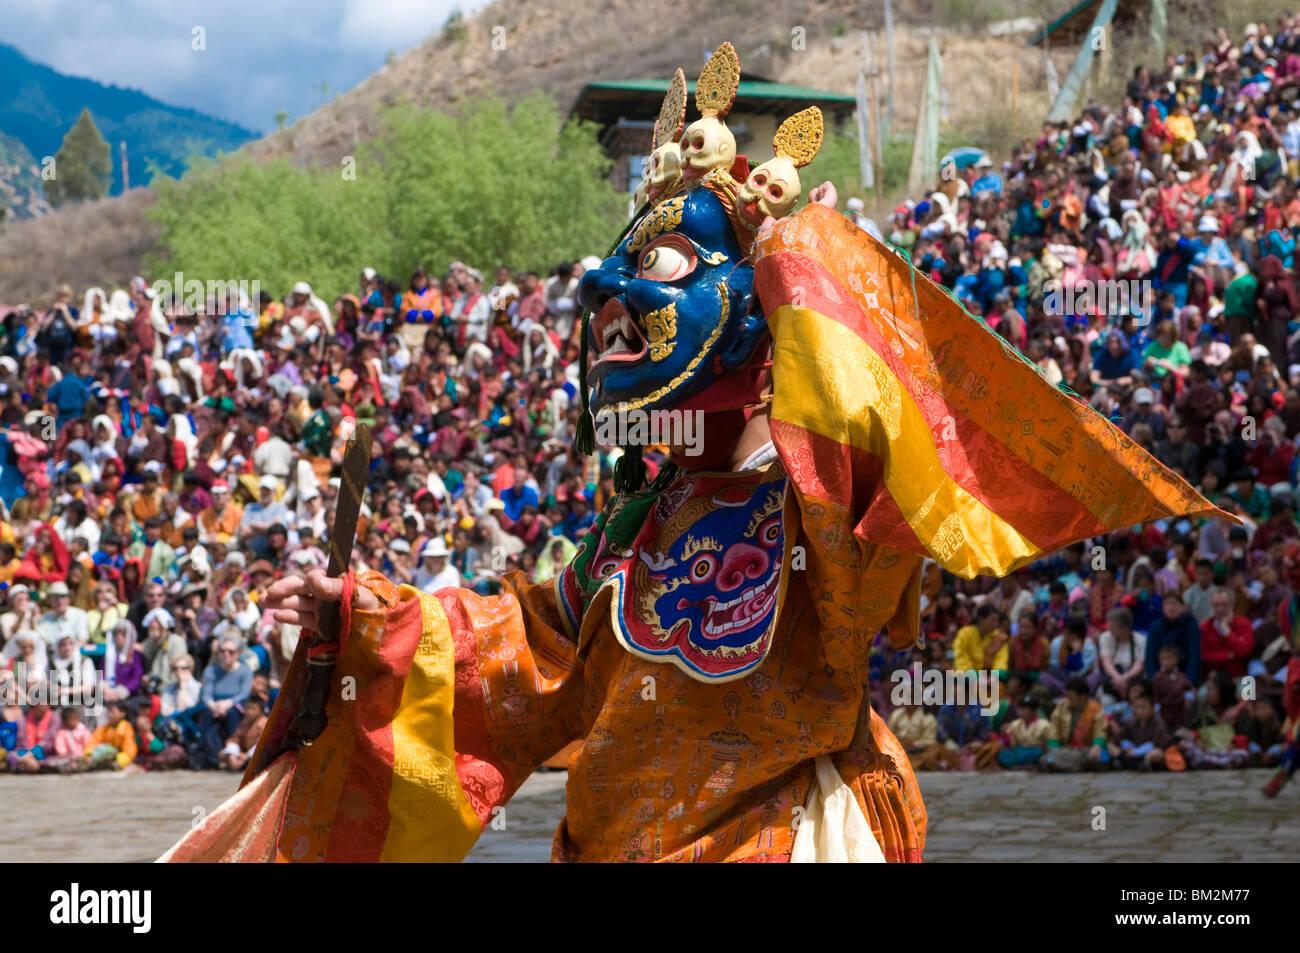 Bailarina vestidos tradicionalmente al Paro Tsechu, una danza religiosa ceremonia, Paro, Bhután Imagen De Stock